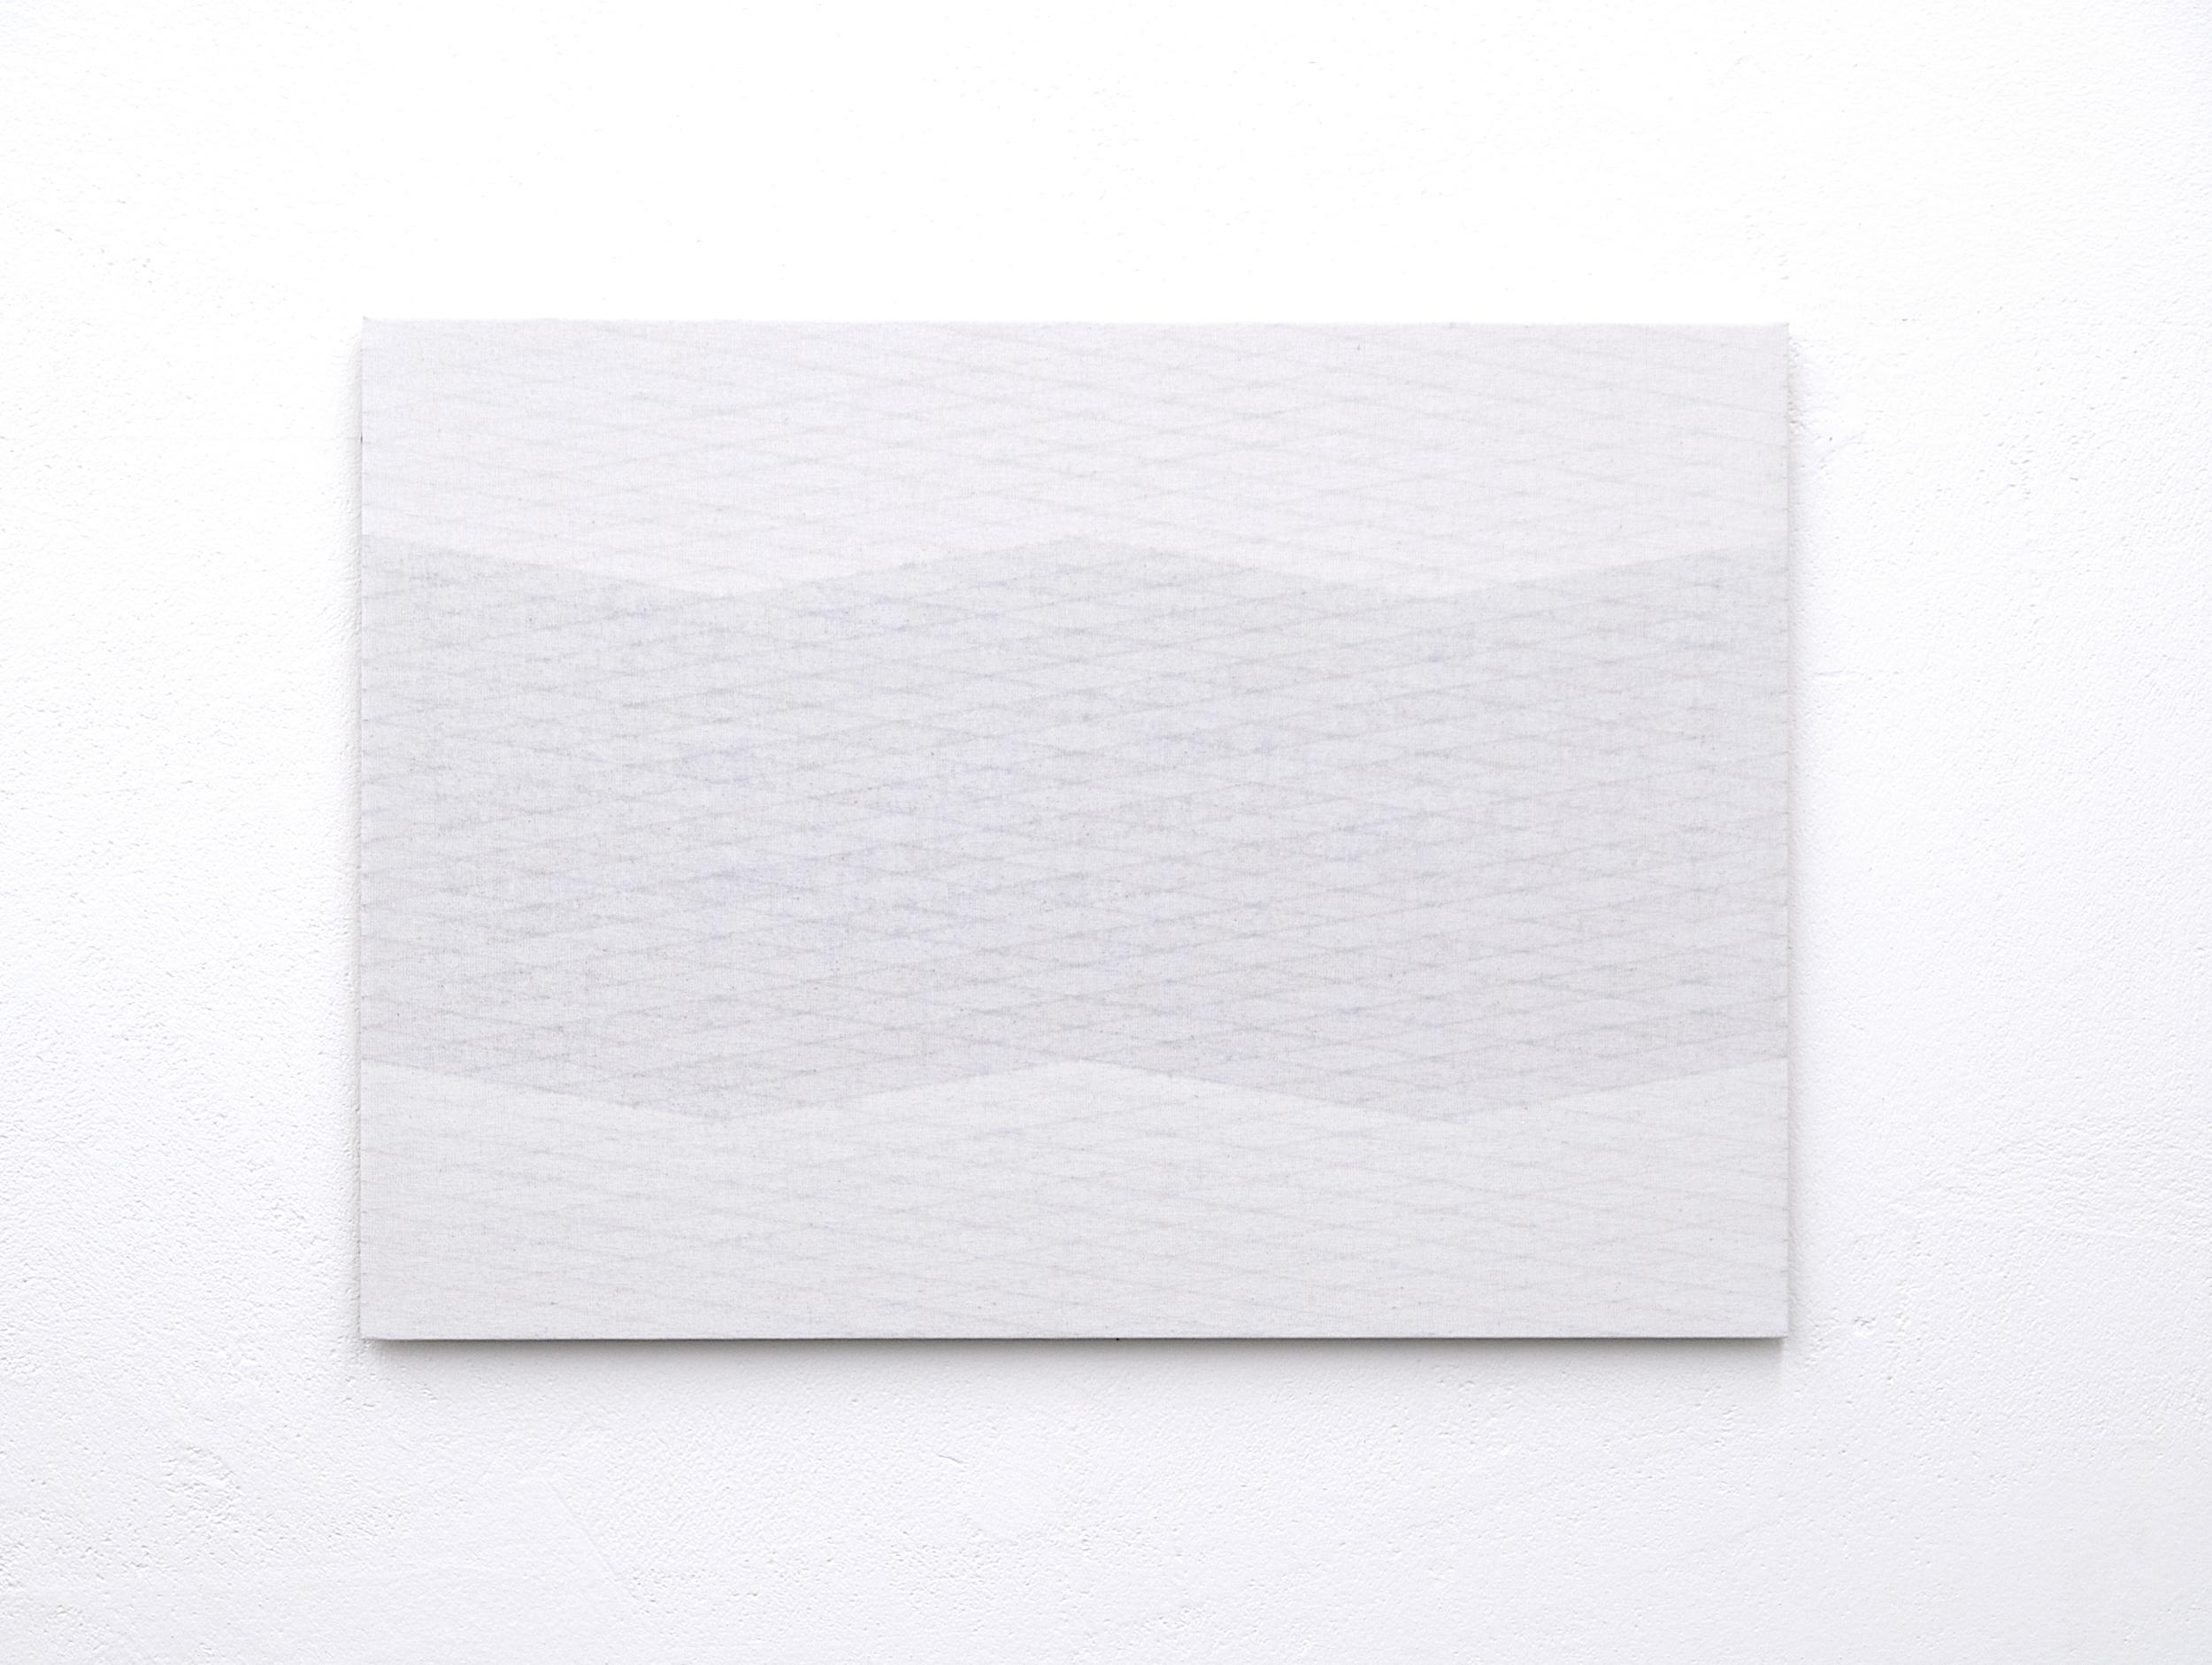 bild nr. 03/2015- 50x 70cm - acryl auf baumwolle/alu